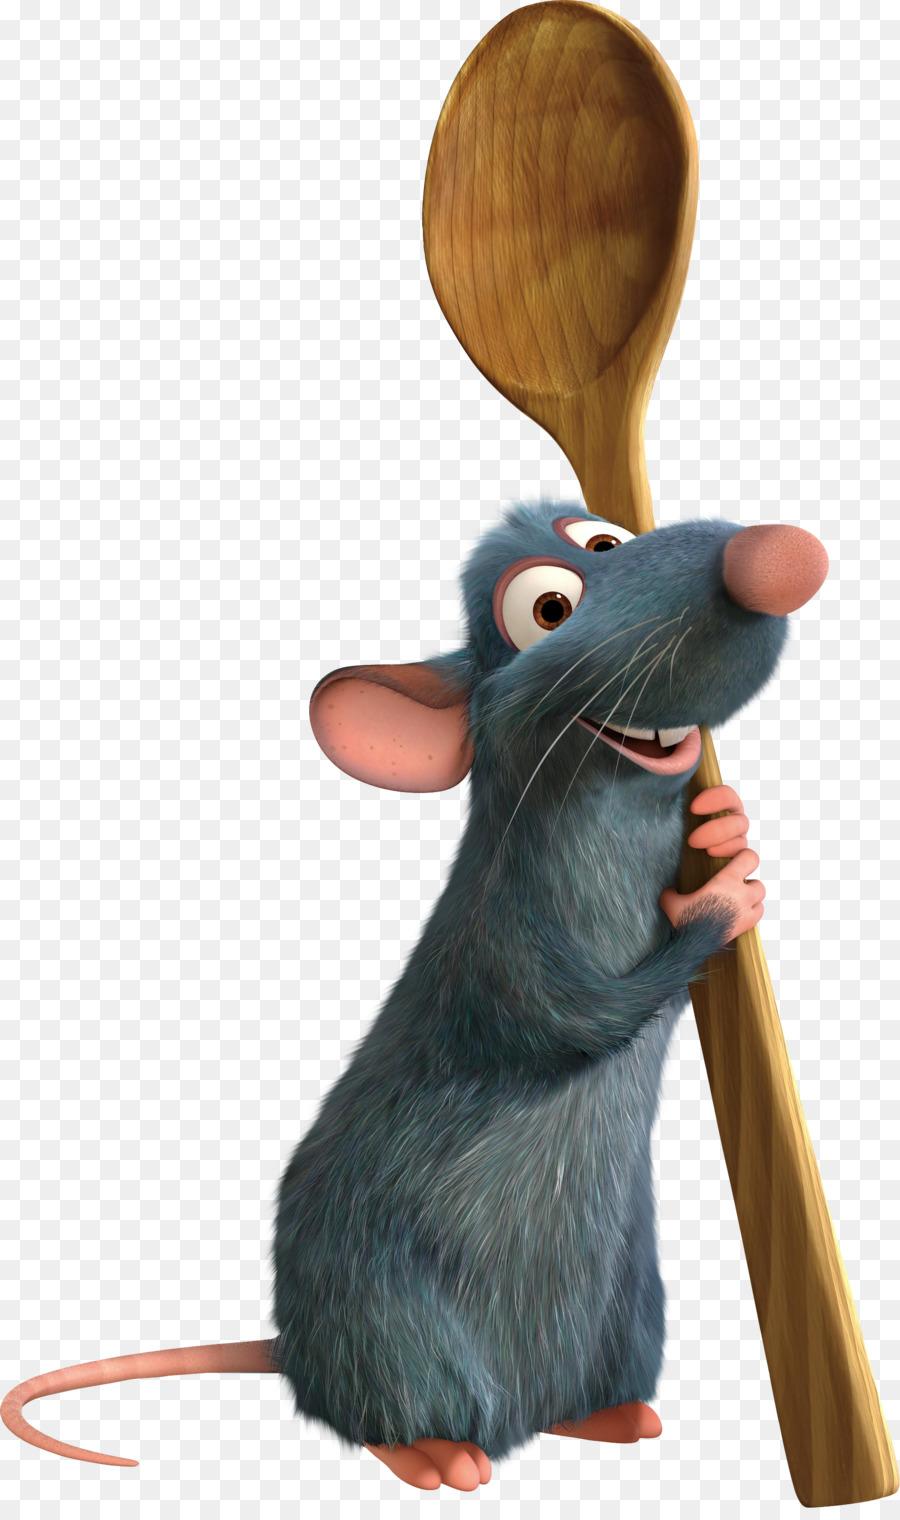 ratatouille french cuisine confit byaldi film pixar - rat png